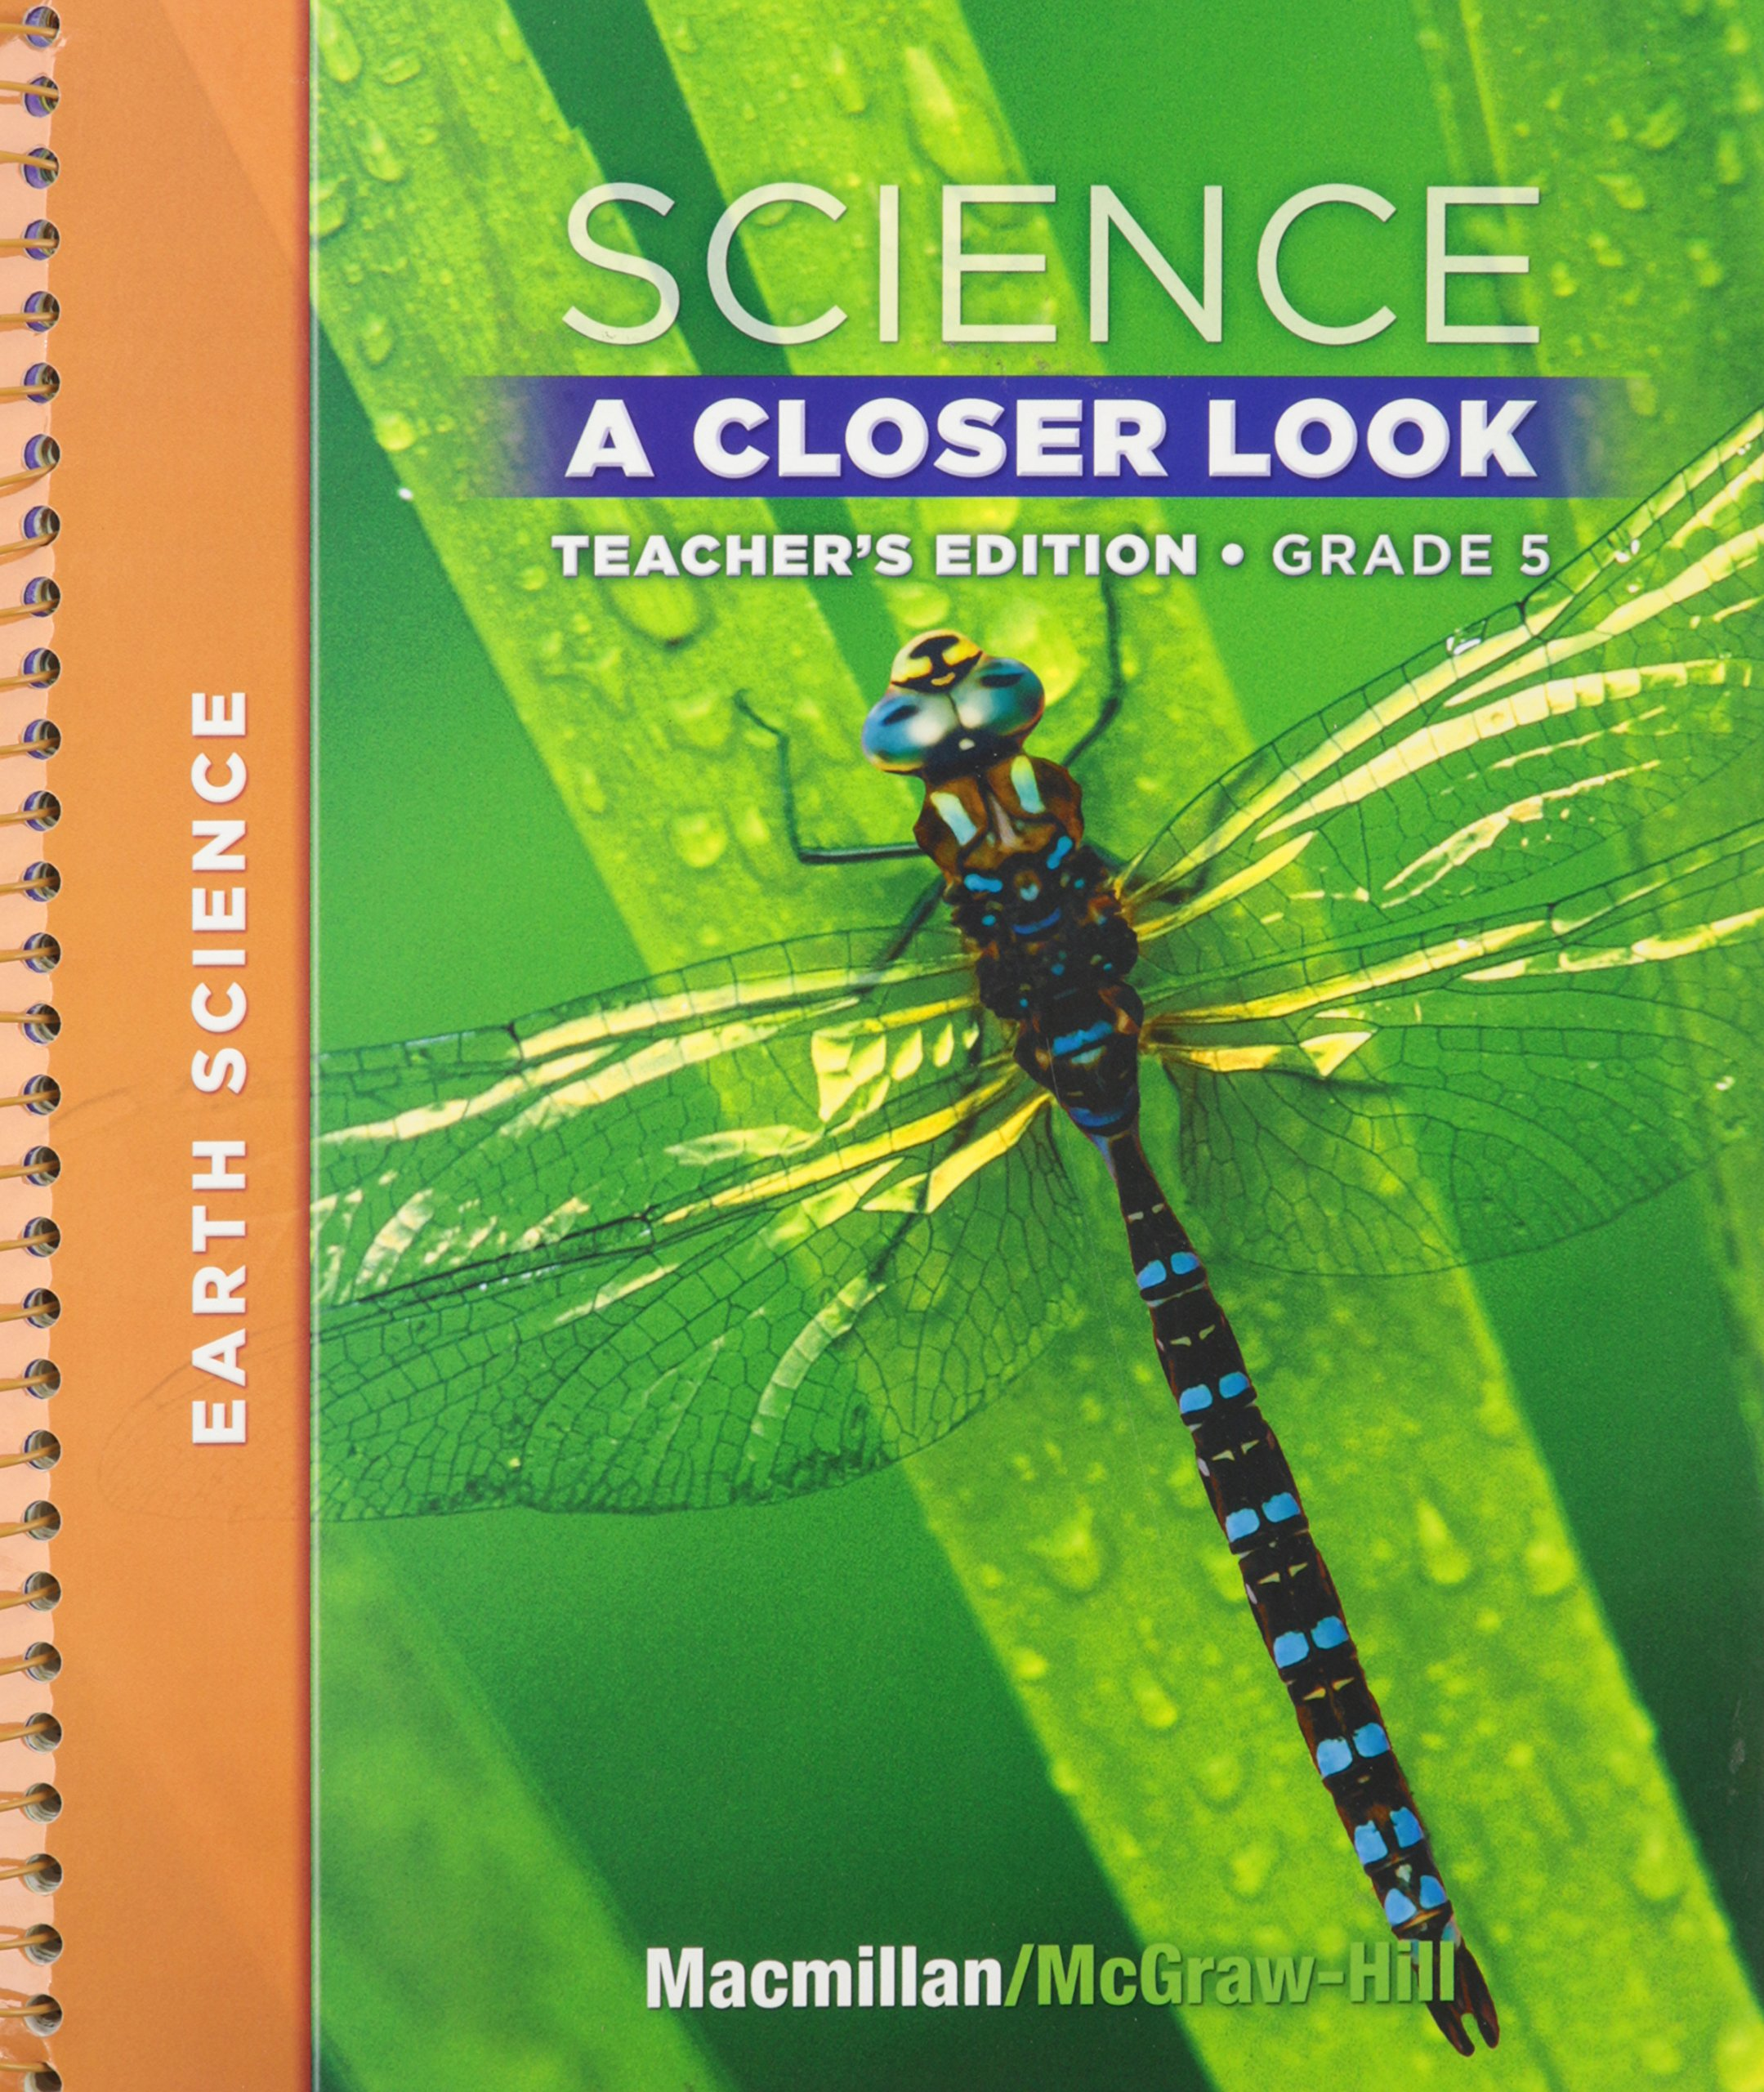 Science a Closer Look - Grade 5 - Teacher's Edition - Earth Science:  Macmillan/McGraw-Hill: 9780022842130: Amazon.com: Books